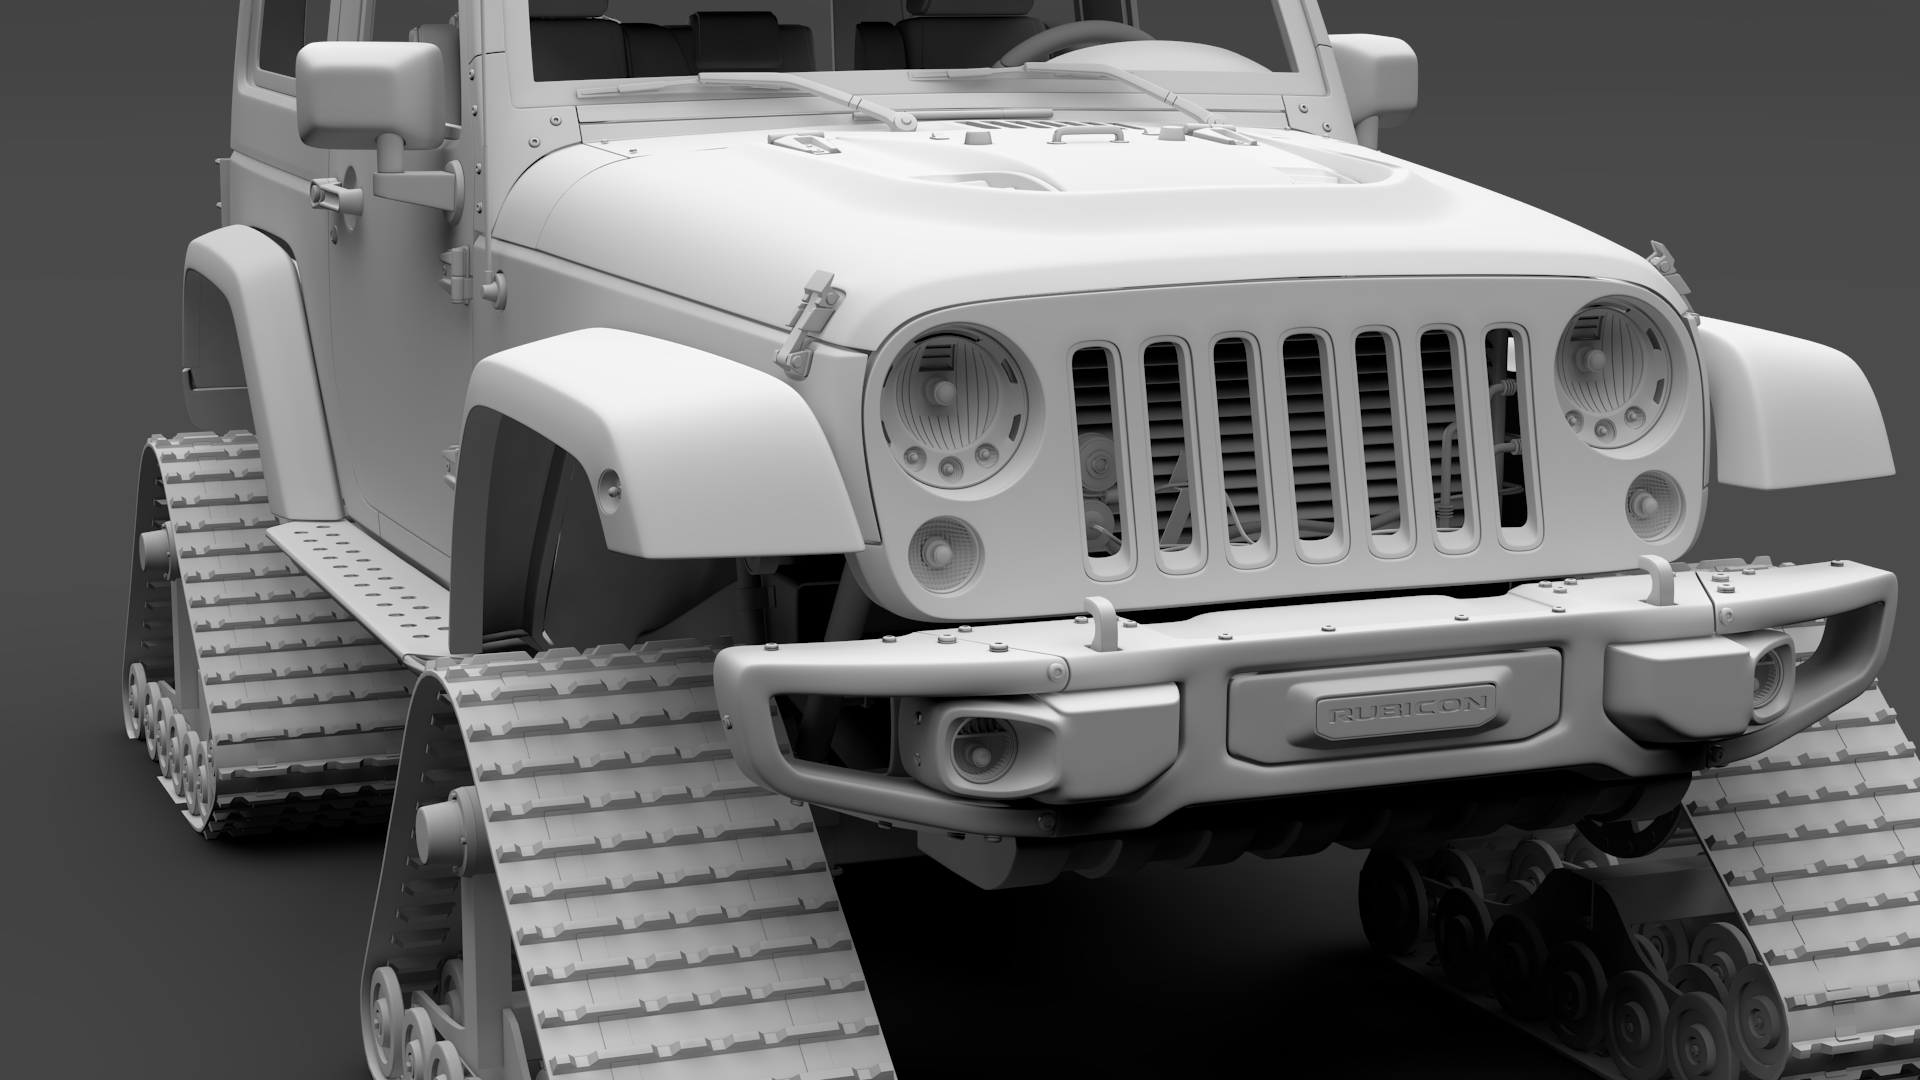 jeep wrangler crawler rubicon recon jk 2017 3d model max fbx c4d lwo ma mb hrc xsi obj 276926